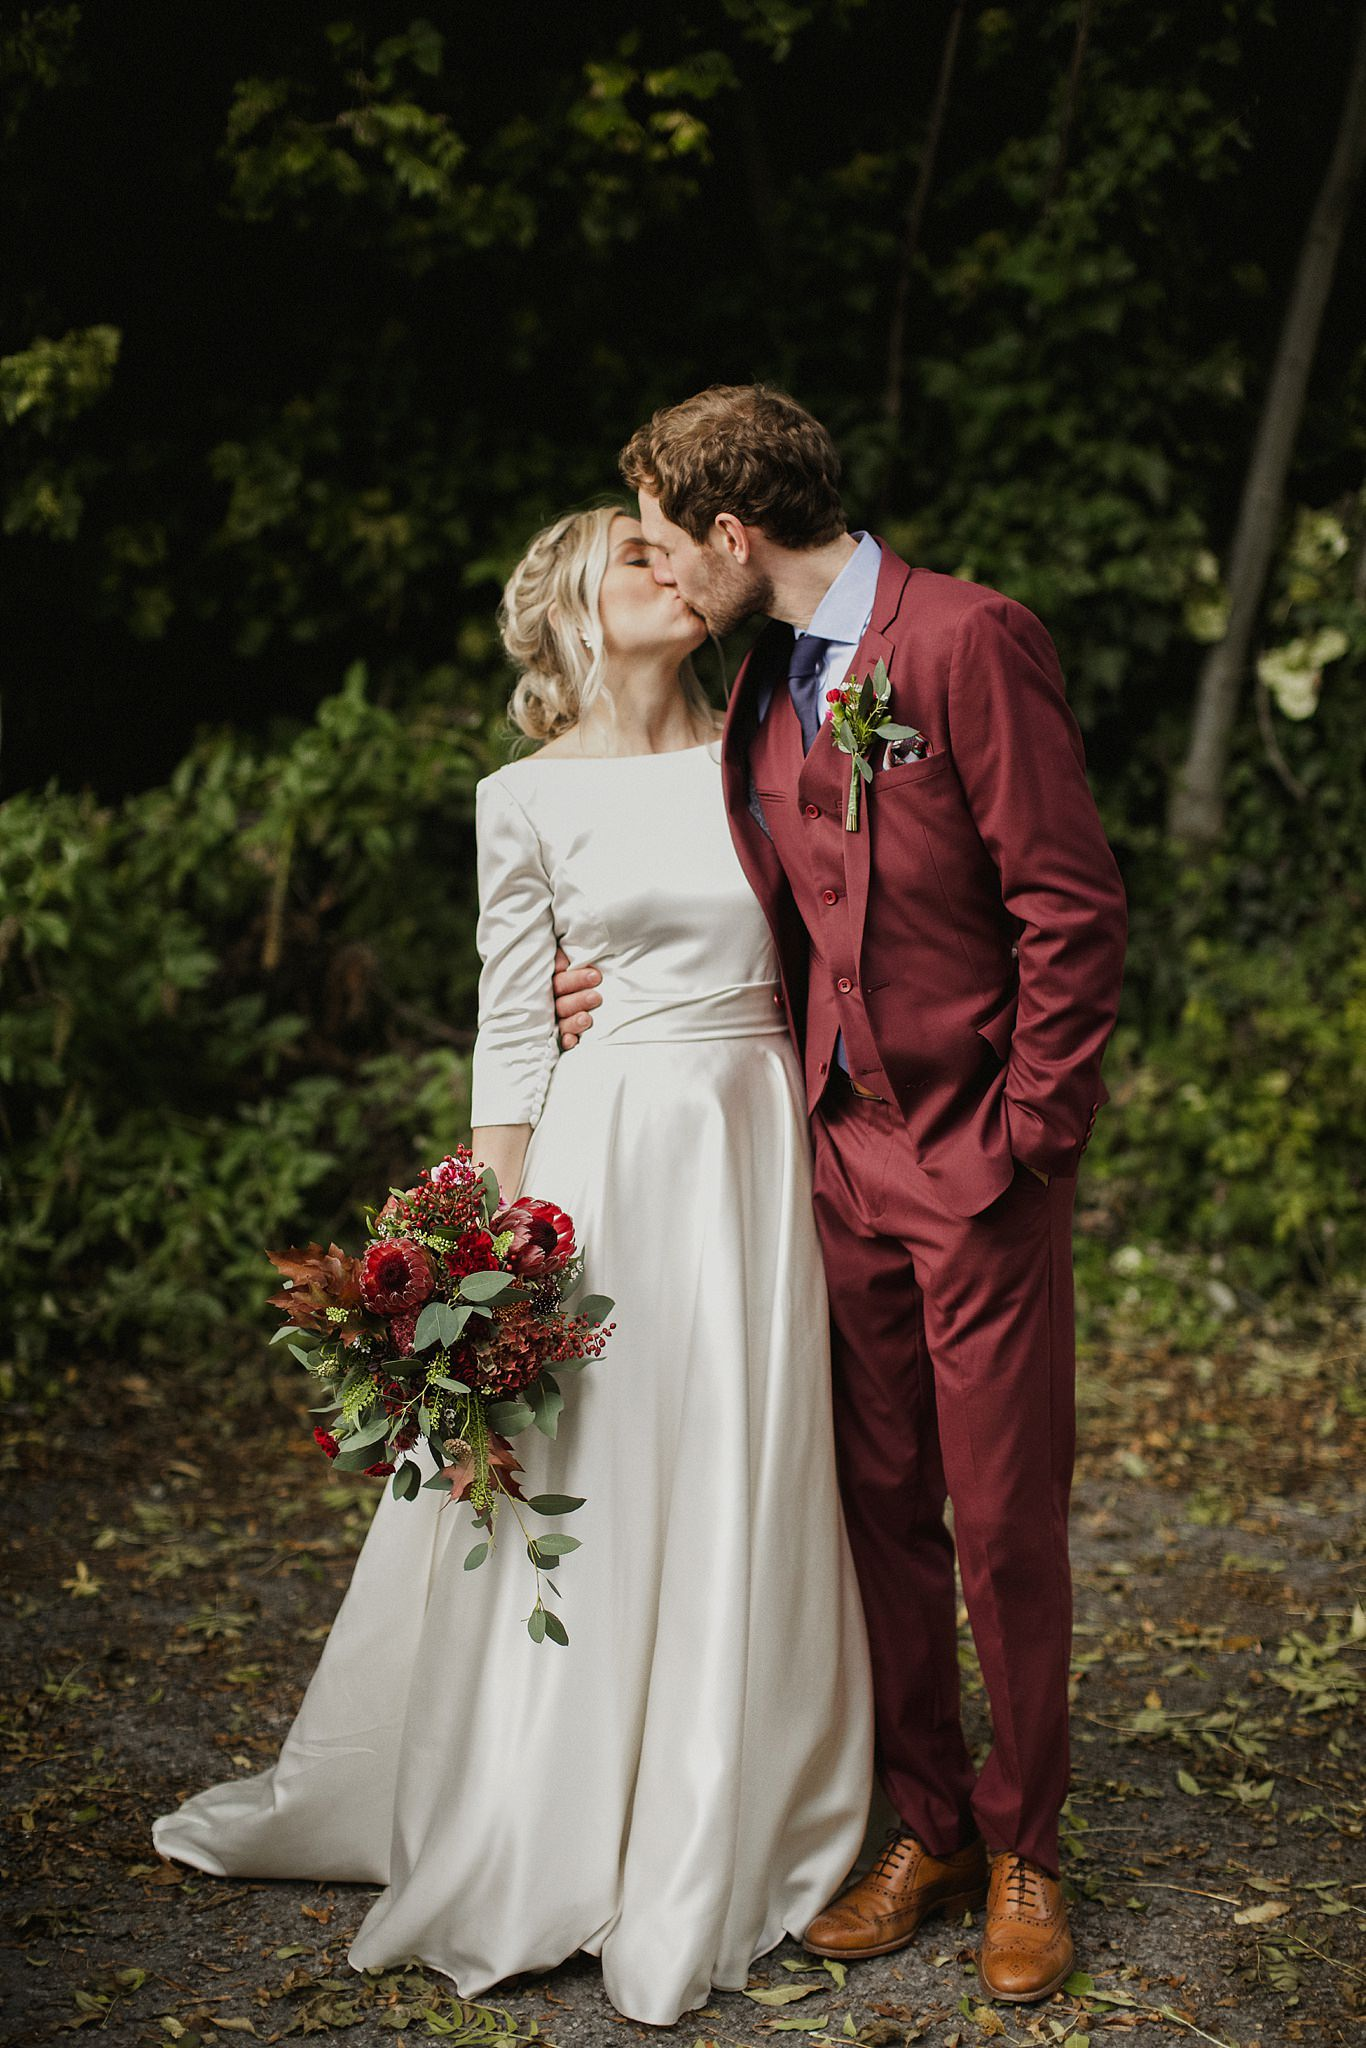 Sheffield_Wedding_Photography_0041.jpg